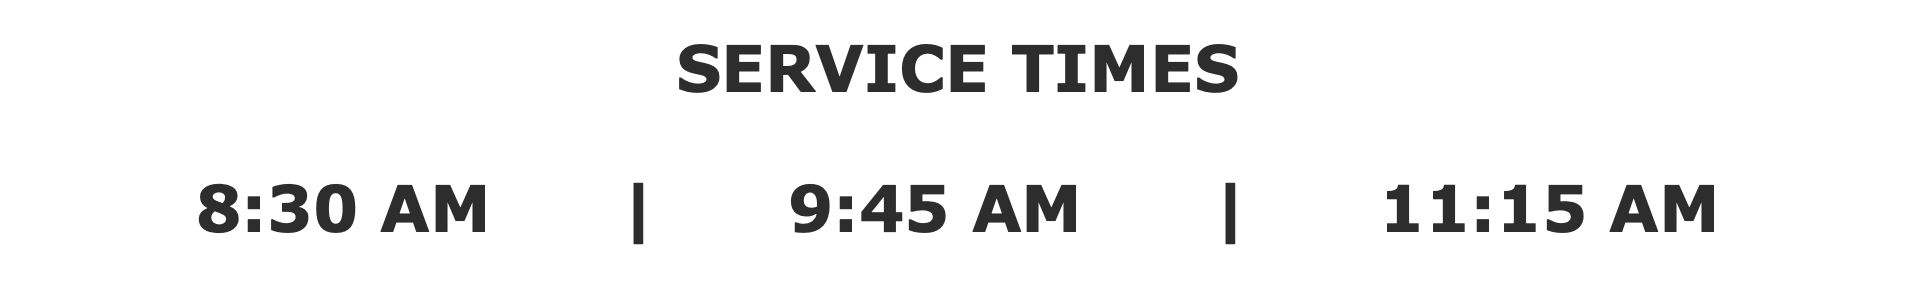 Website_Service_Times.jpg